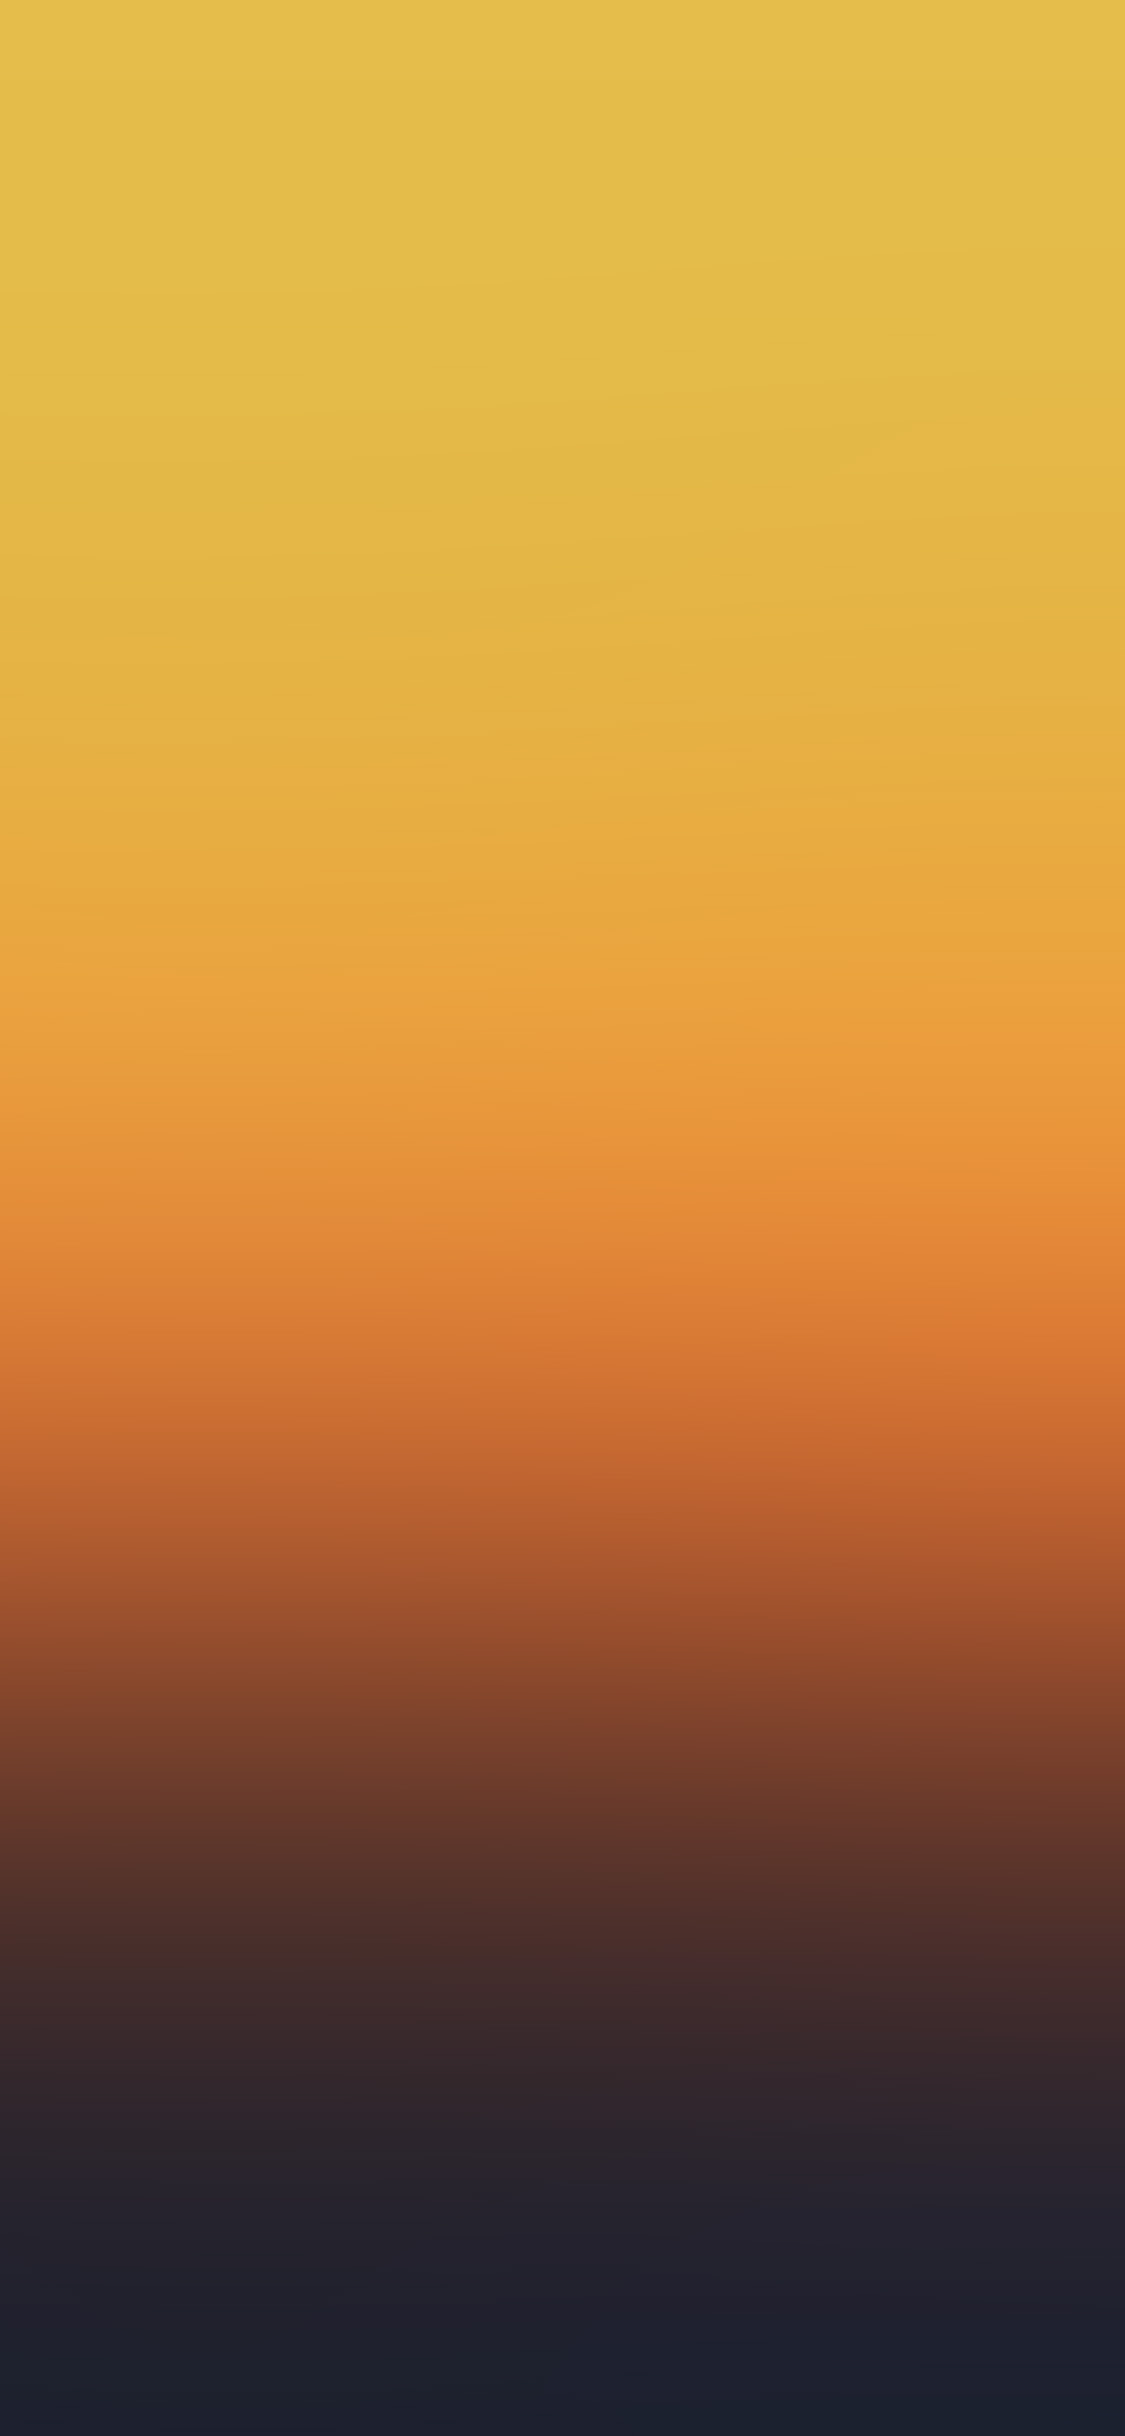 iPhoneXpapers.com-Apple-iPhone-wallpaper-sl83-yellow-fire-blur-gradation